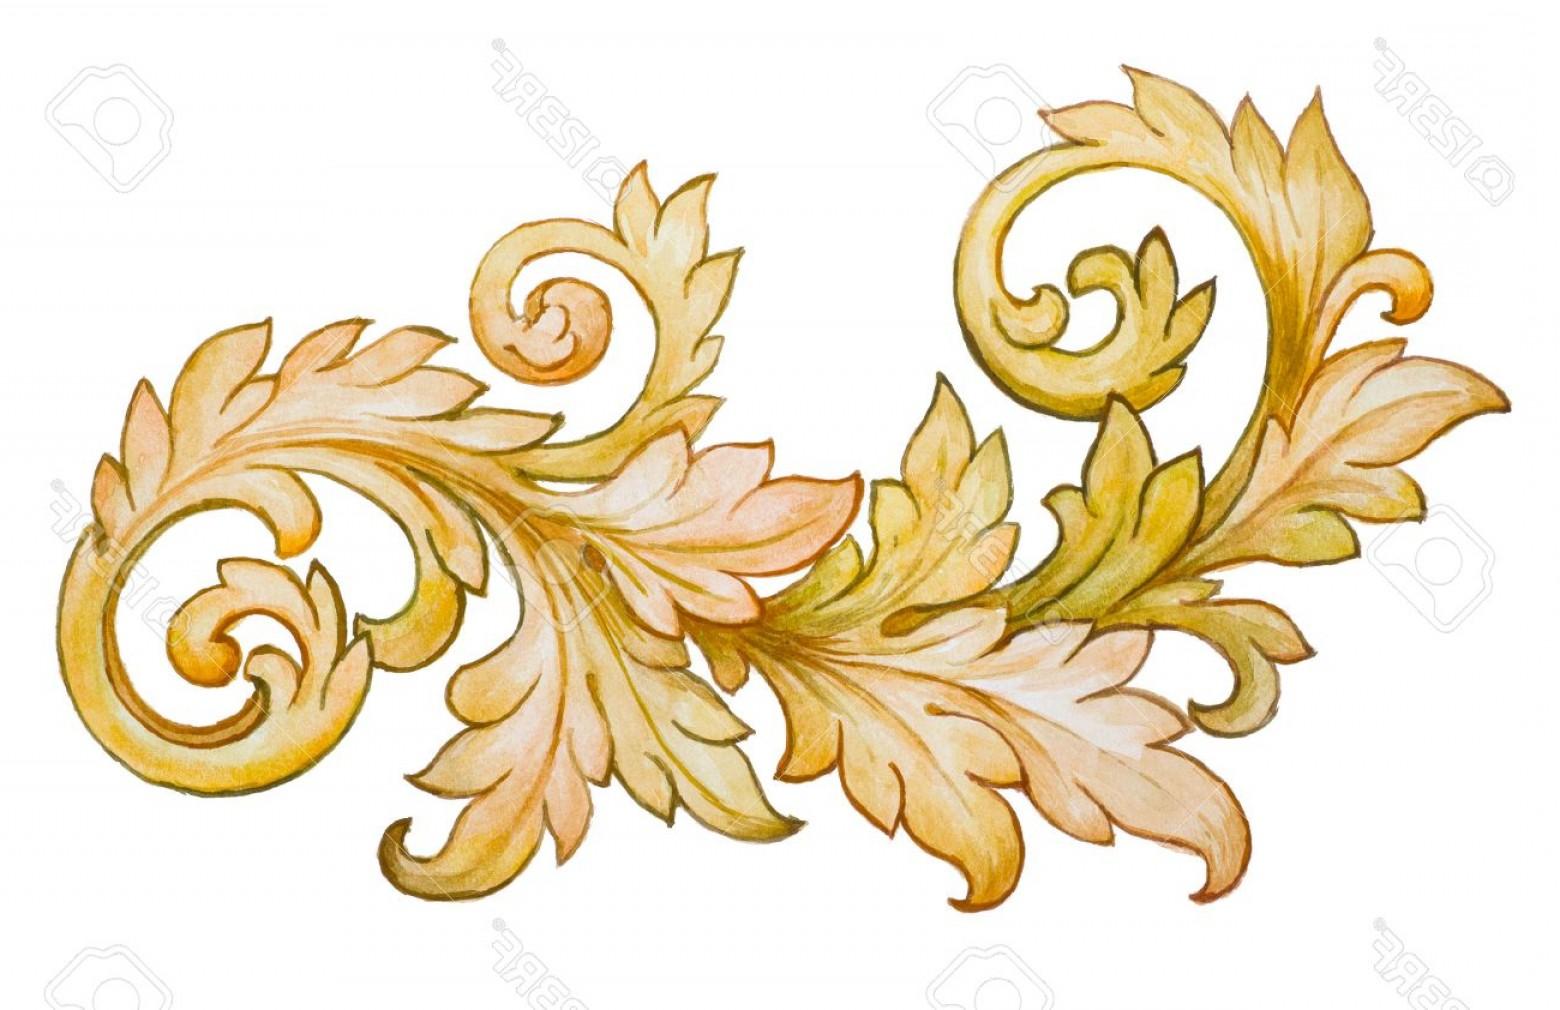 1560x1010 Photostock Vector Vintage Baroque Floral Scroll Foliage Ornament